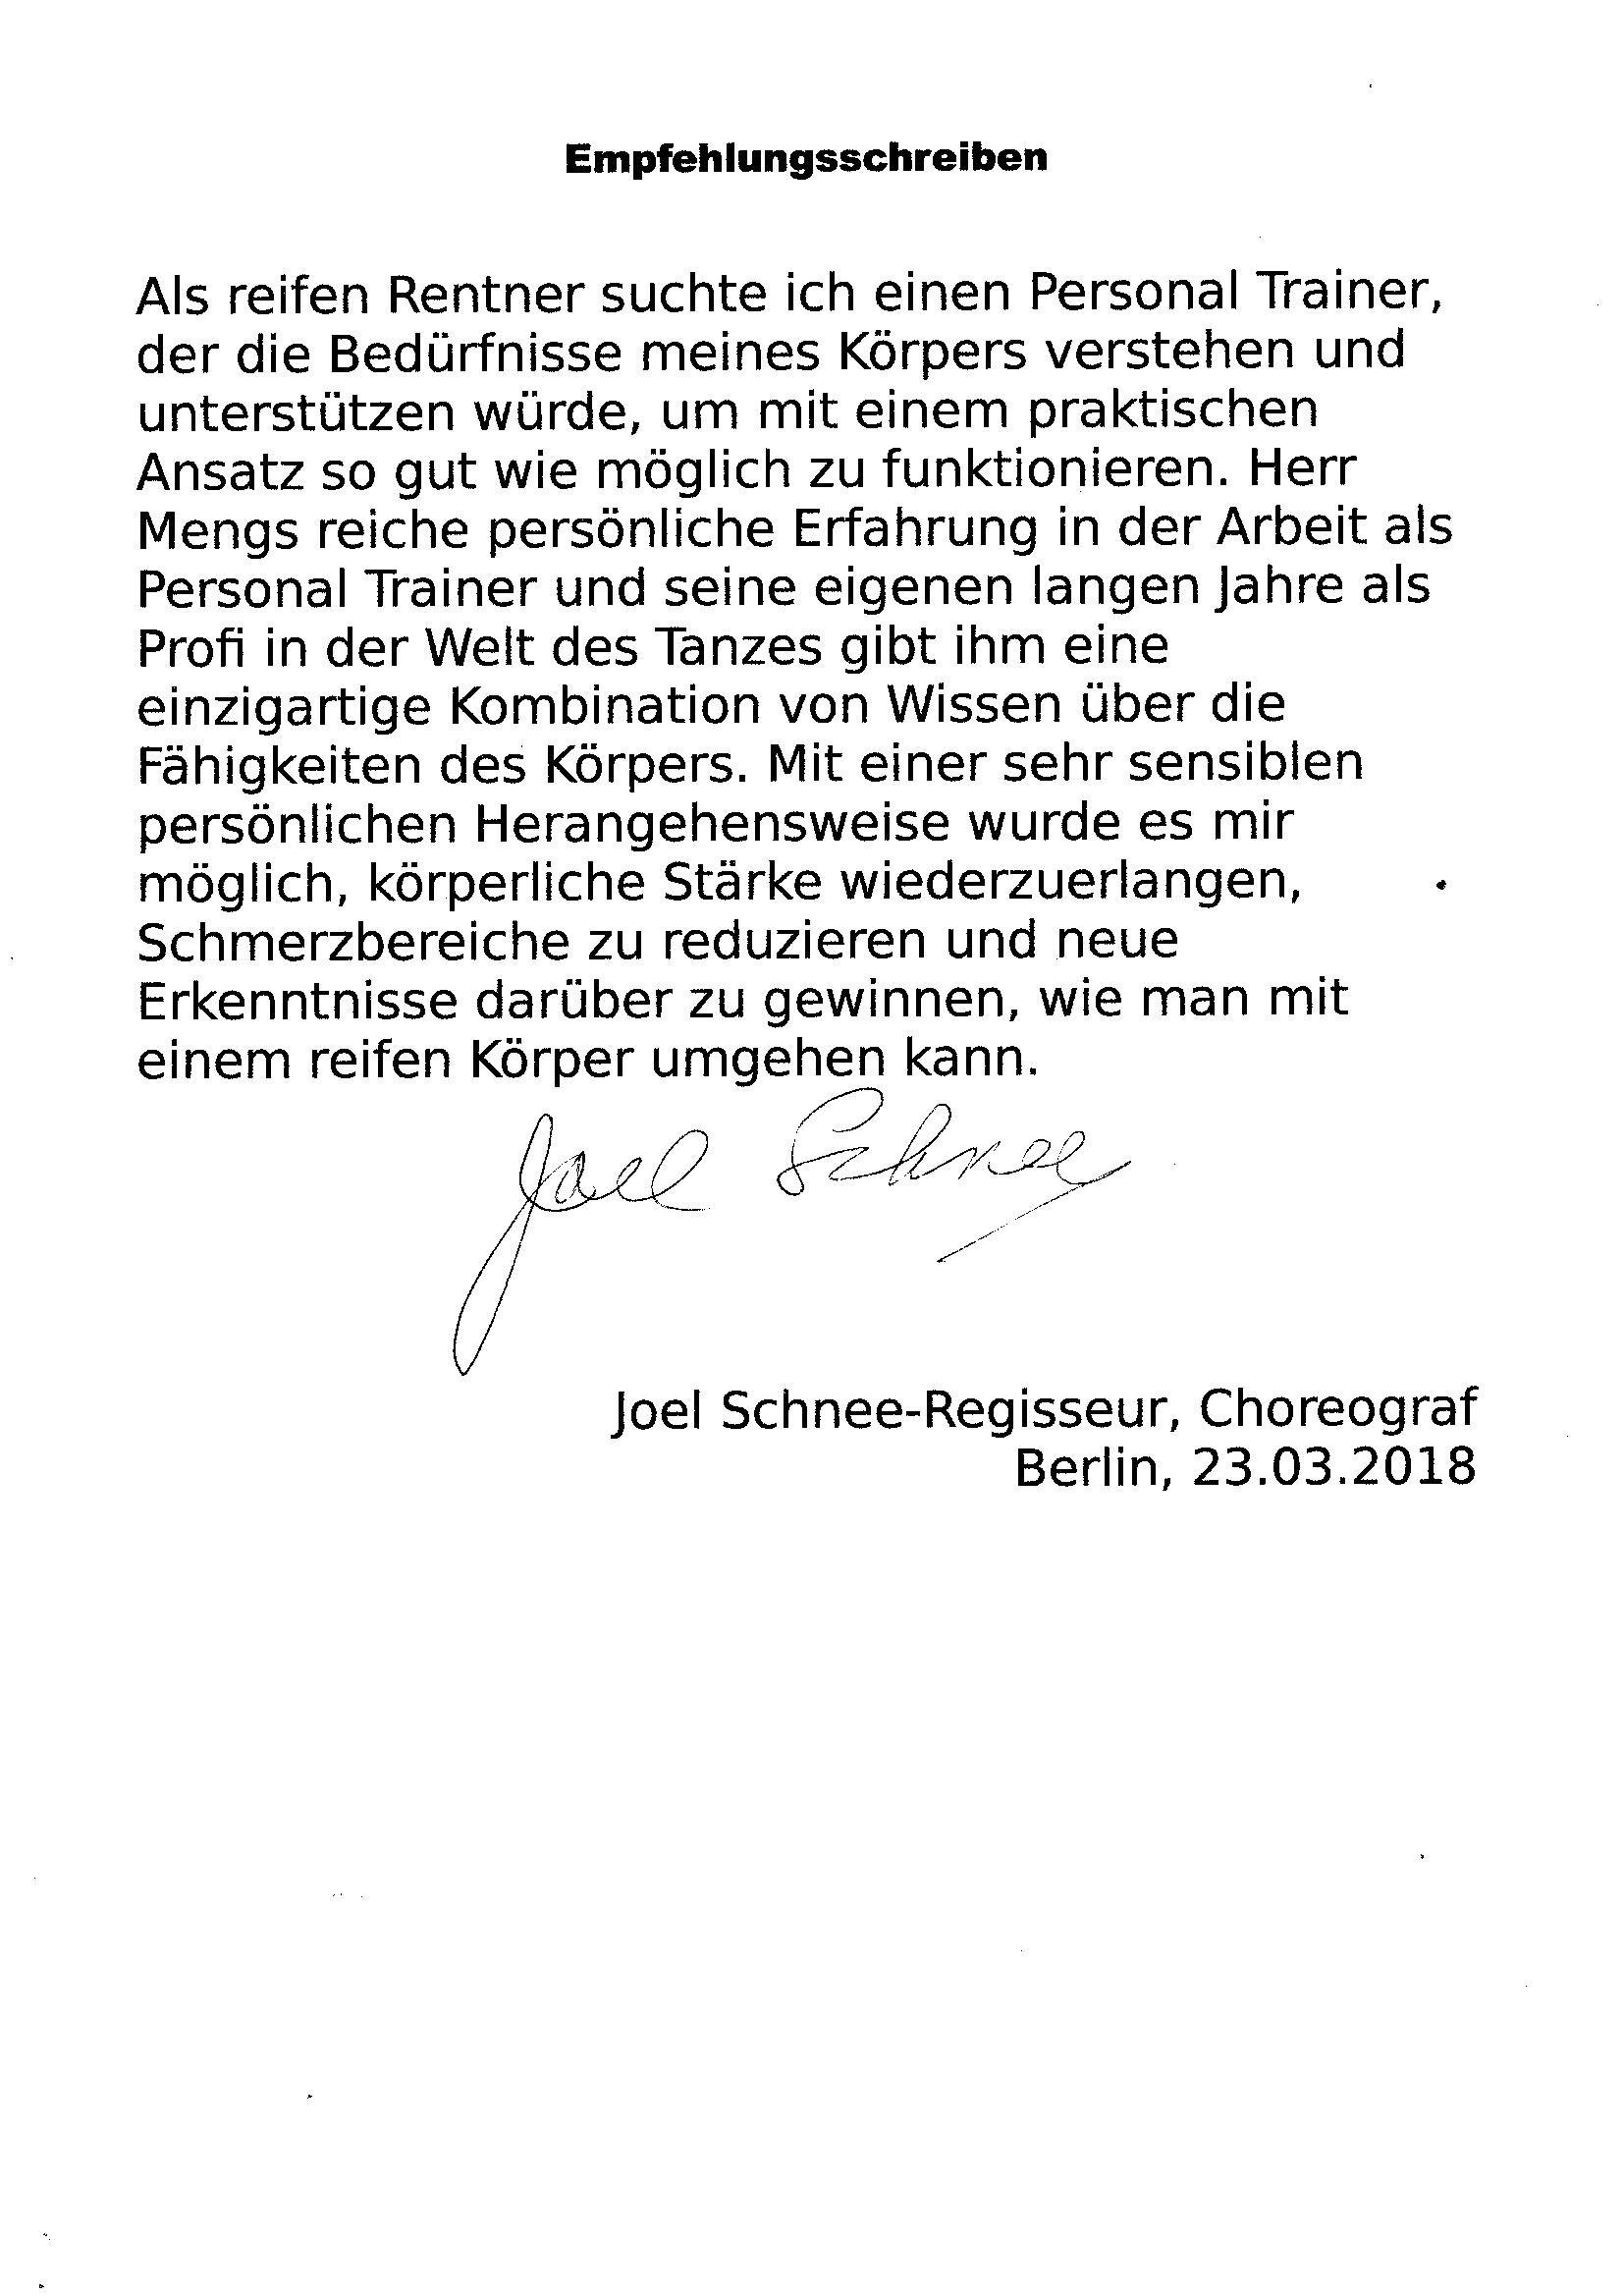 E Referenz J. Schnee